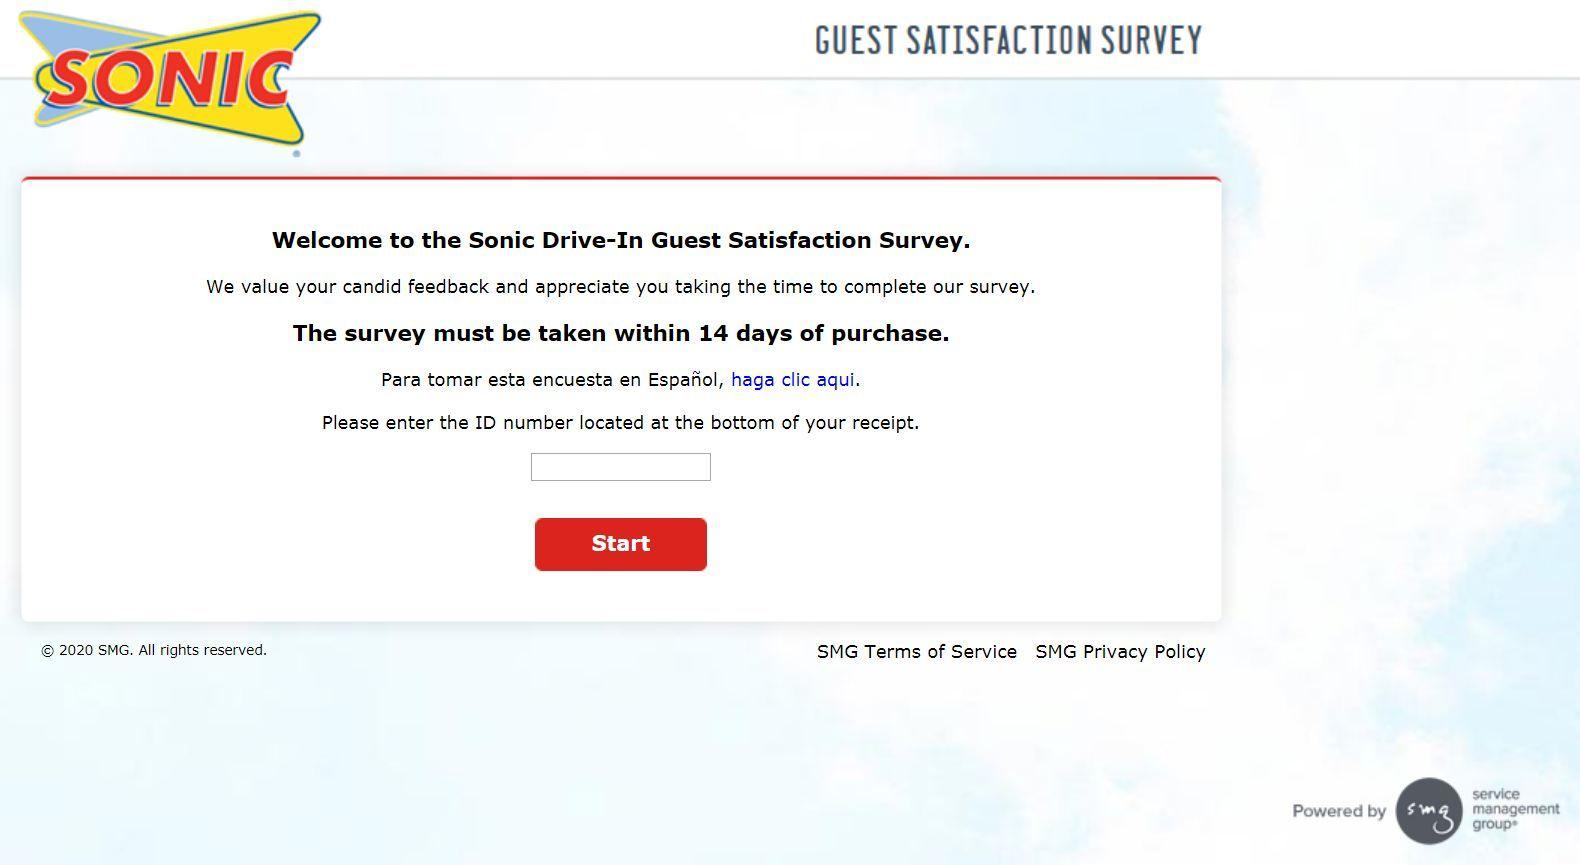 Talktosonic Free Drink Food Guest Satisfaction Survey Surveys Free Food Coupons Marketing Tactics